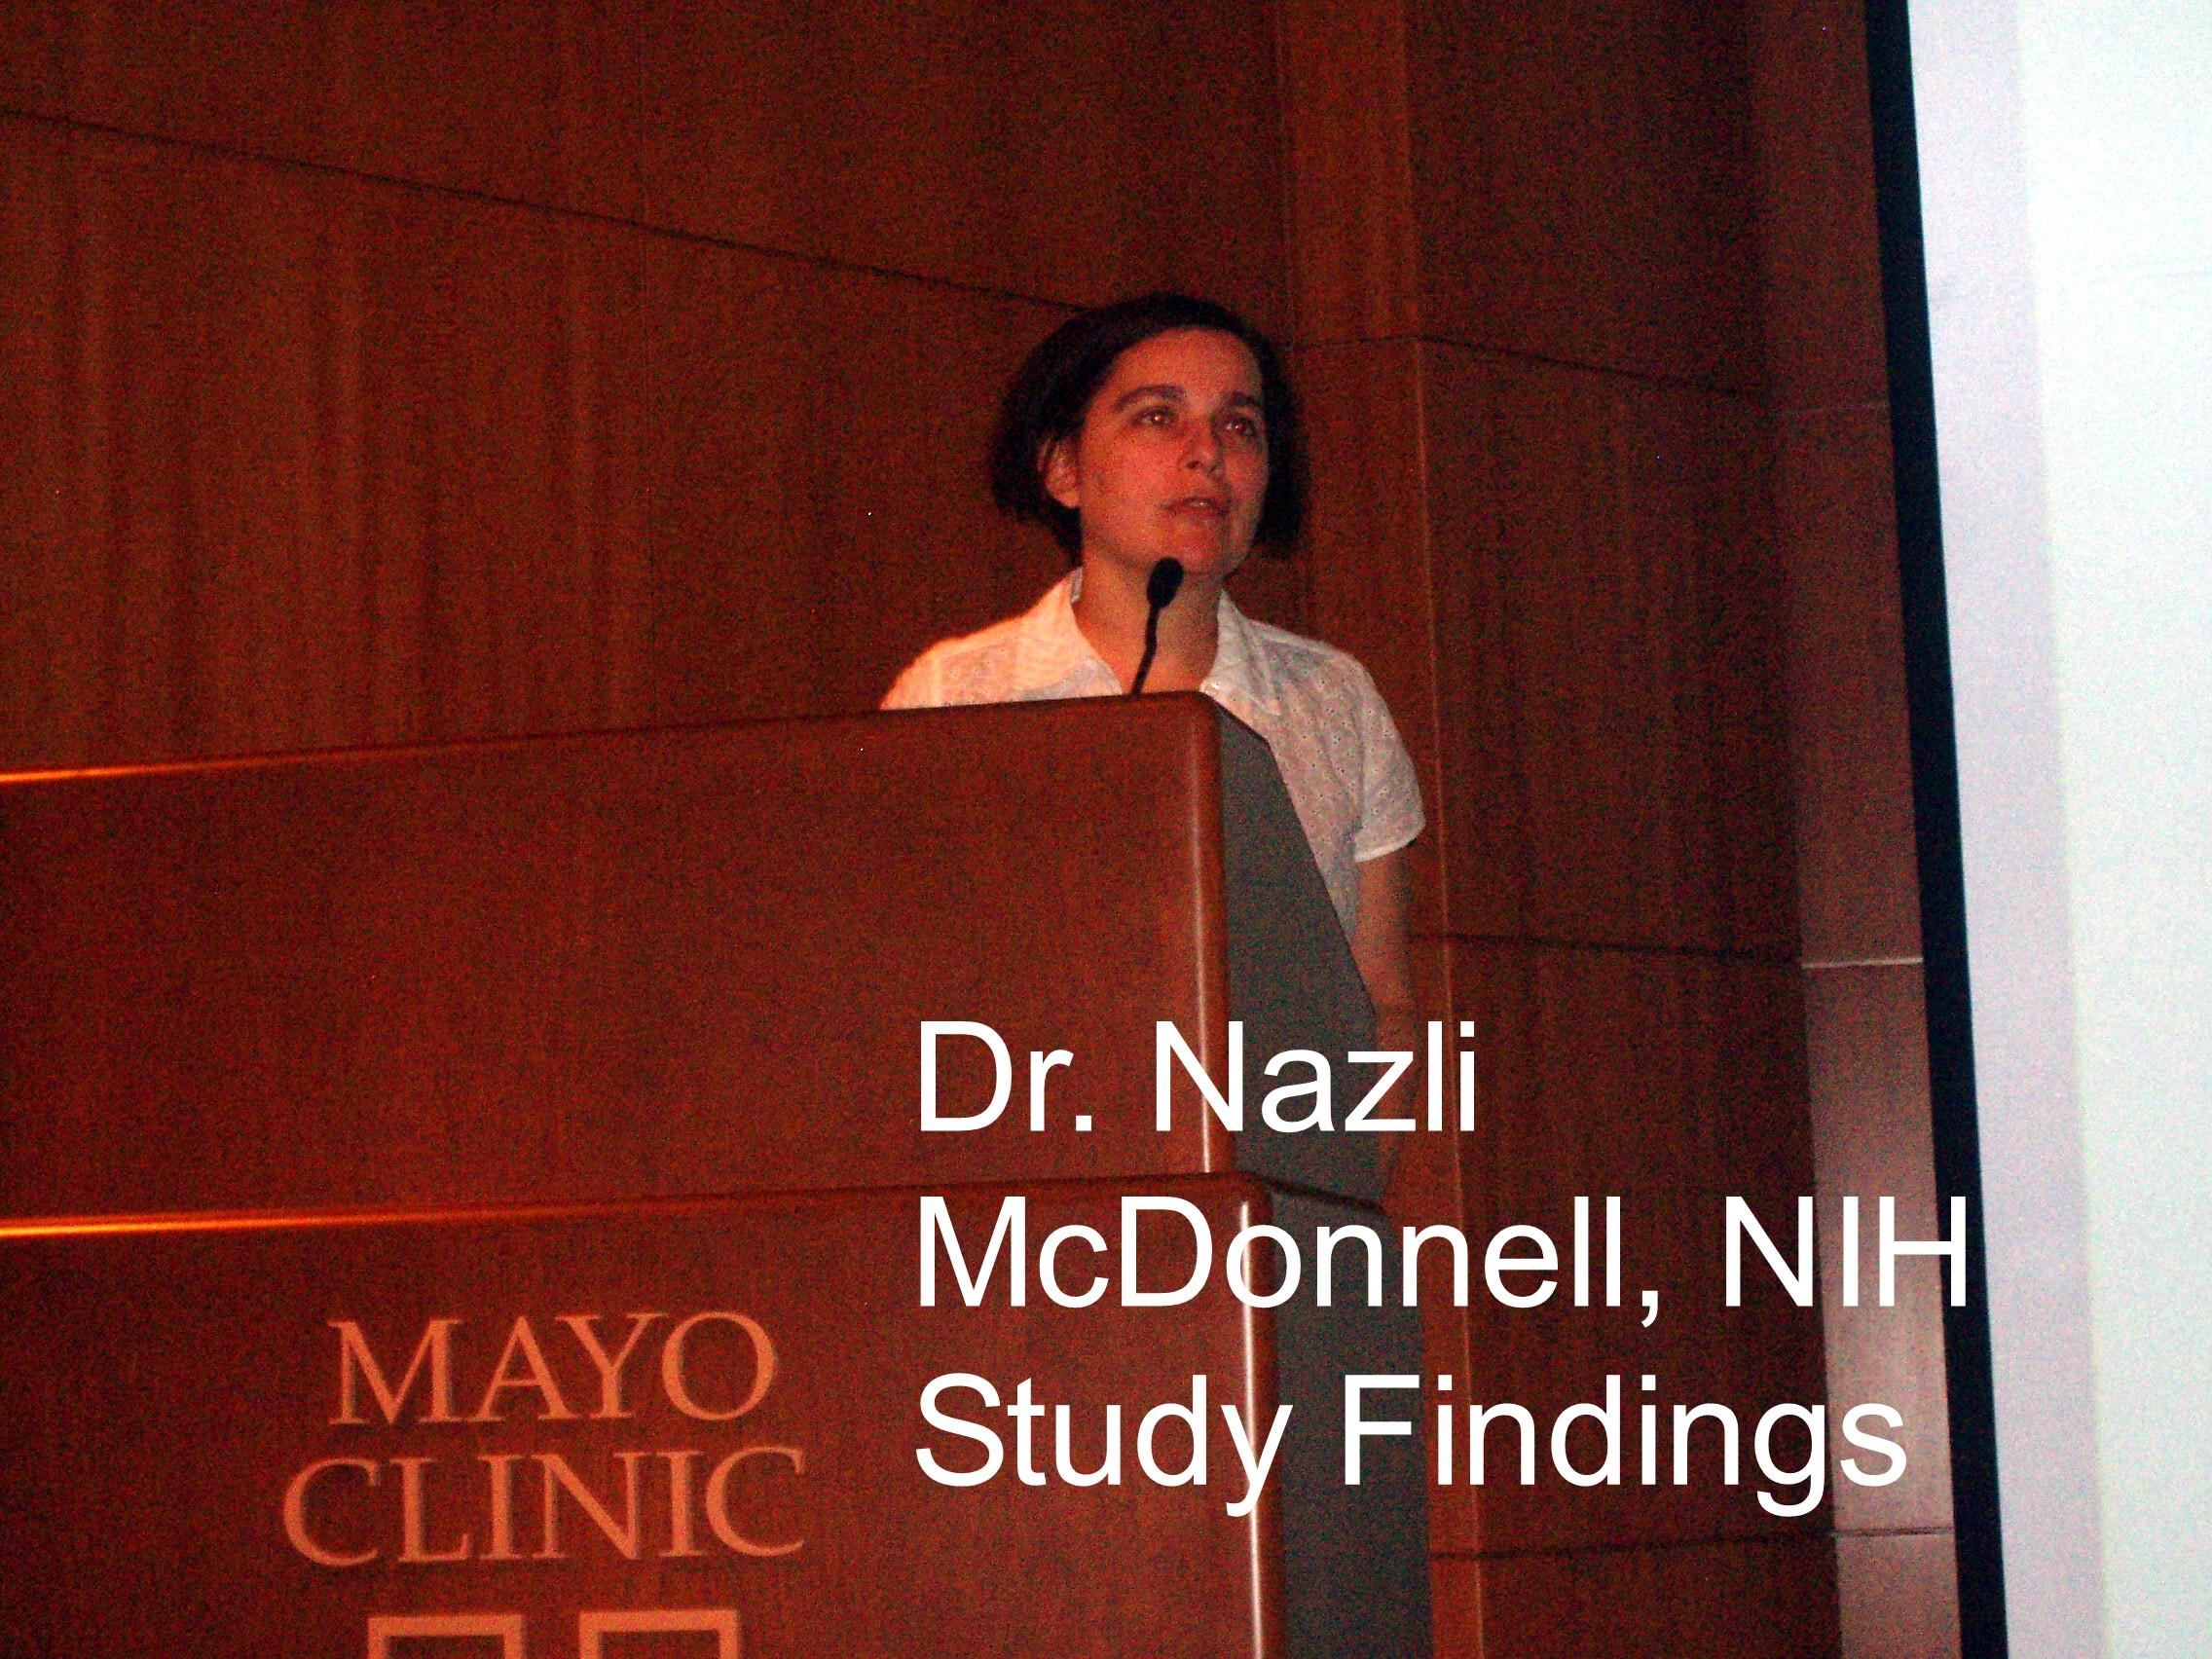 Dr. Nazli McDonnell-NIH/NIA